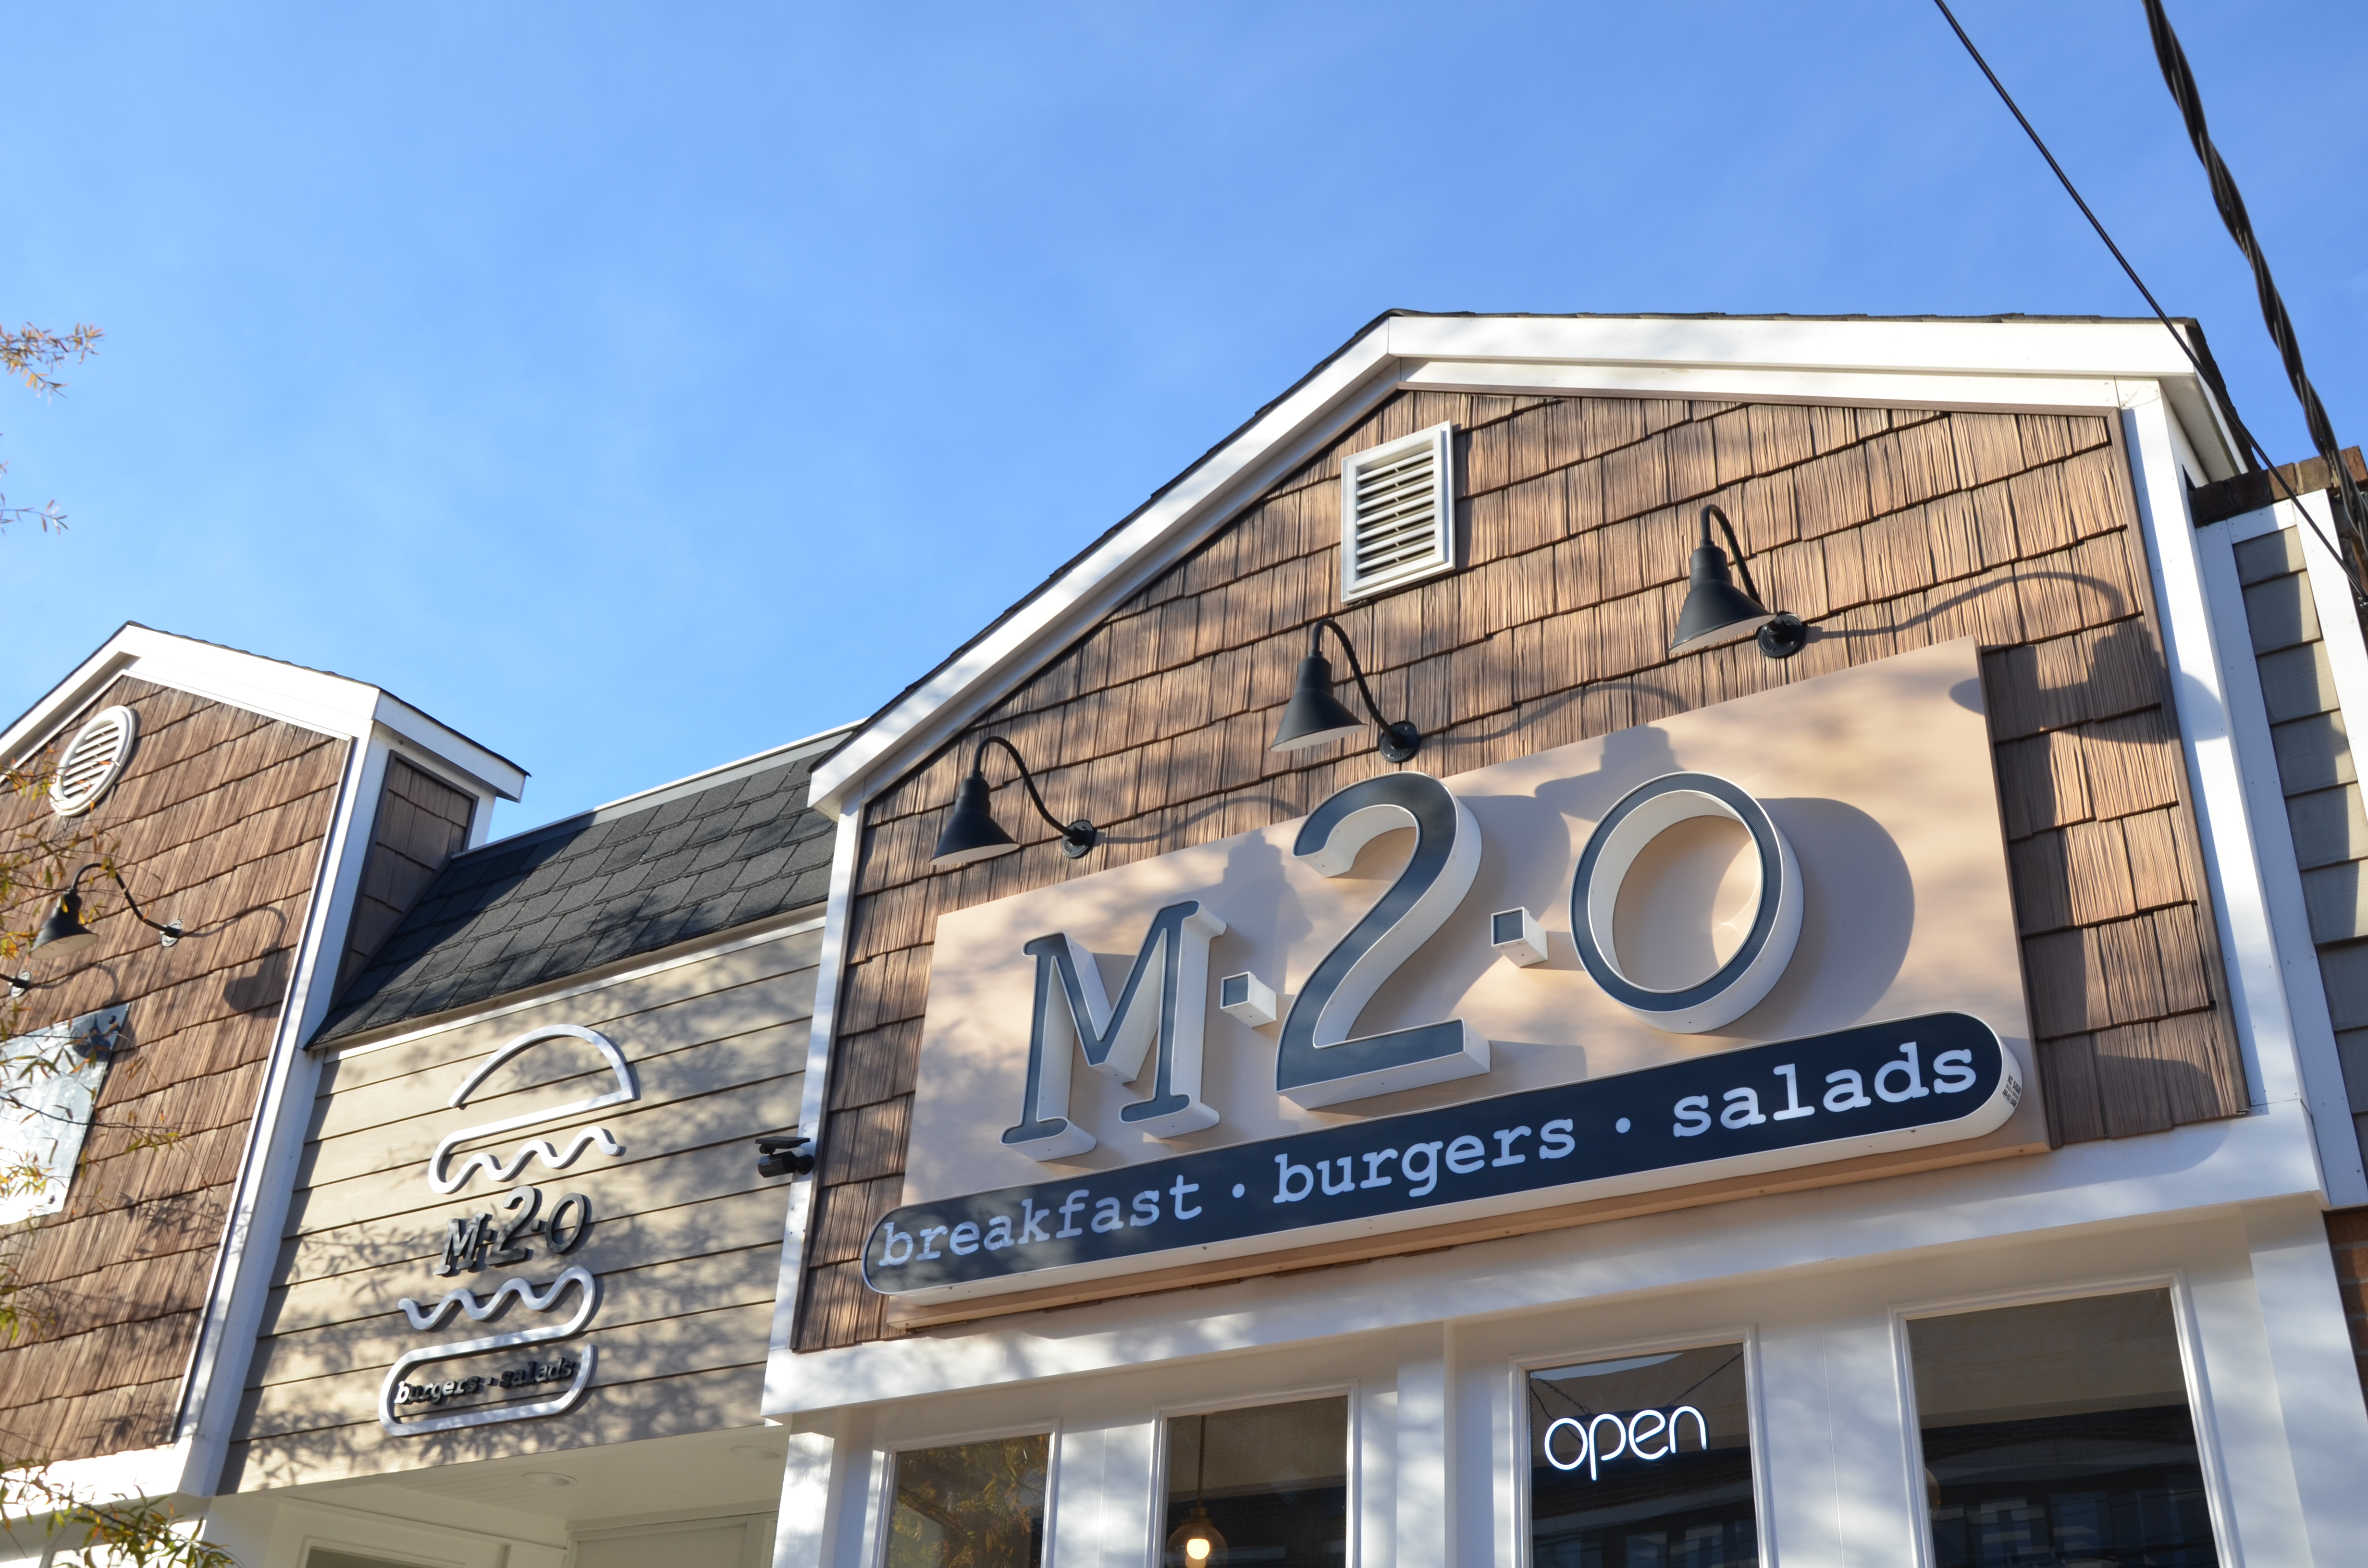 M2O Burgers and Salads